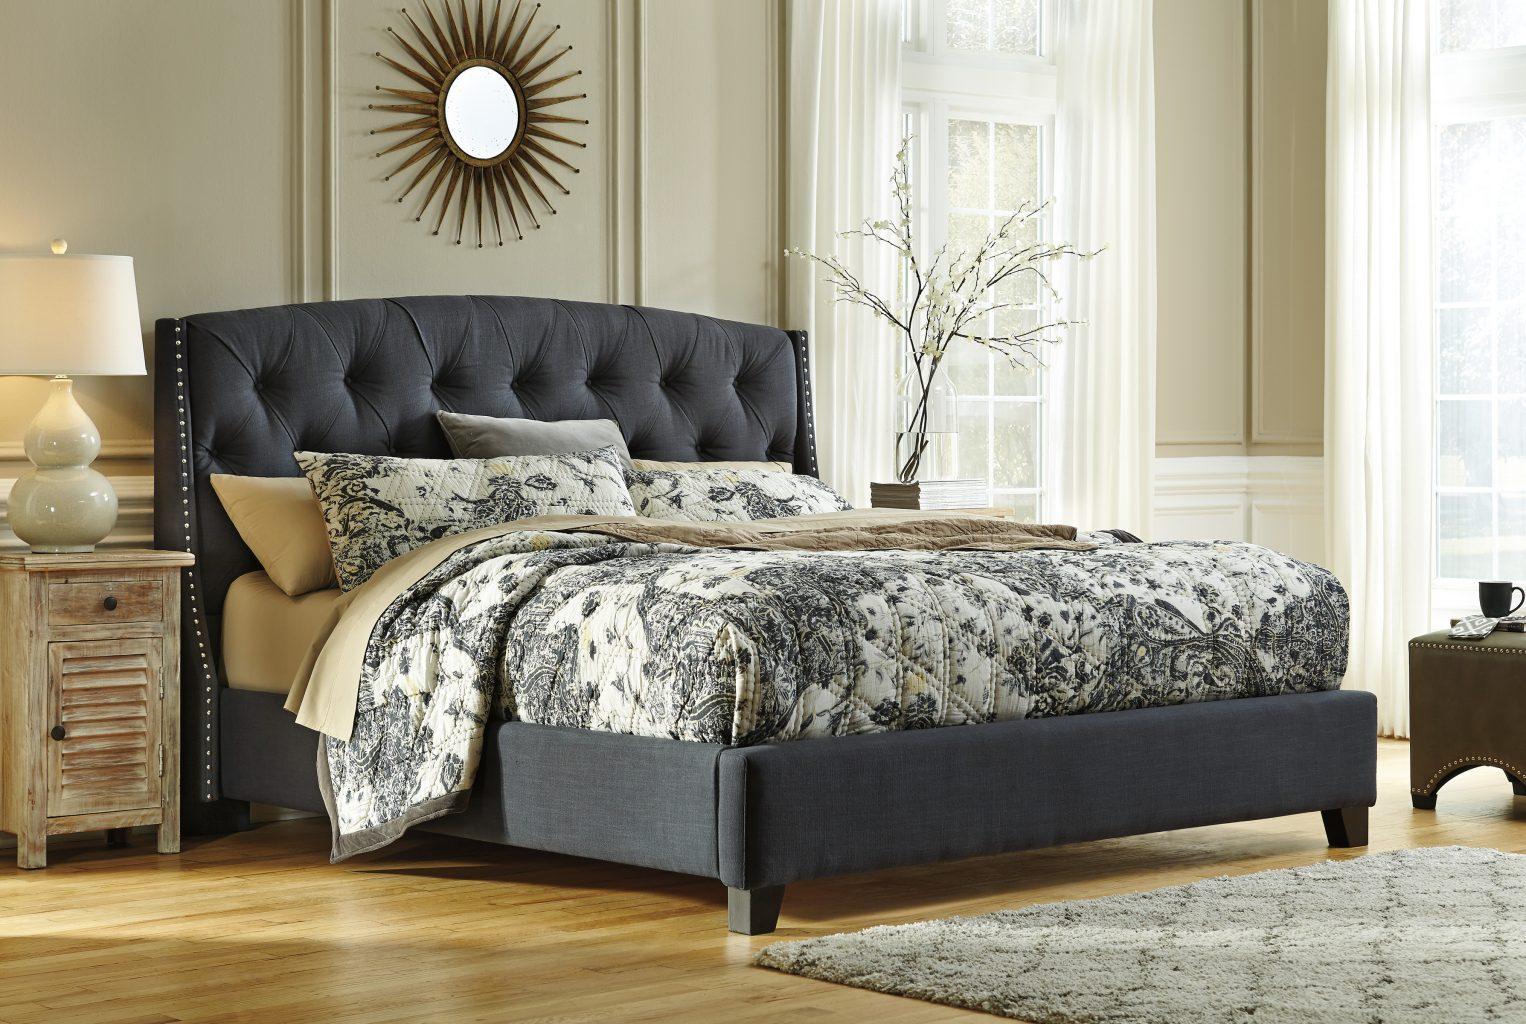 Living Room Furniture St Louis Mcguire Furniture Furniture Rentals Sales New Used